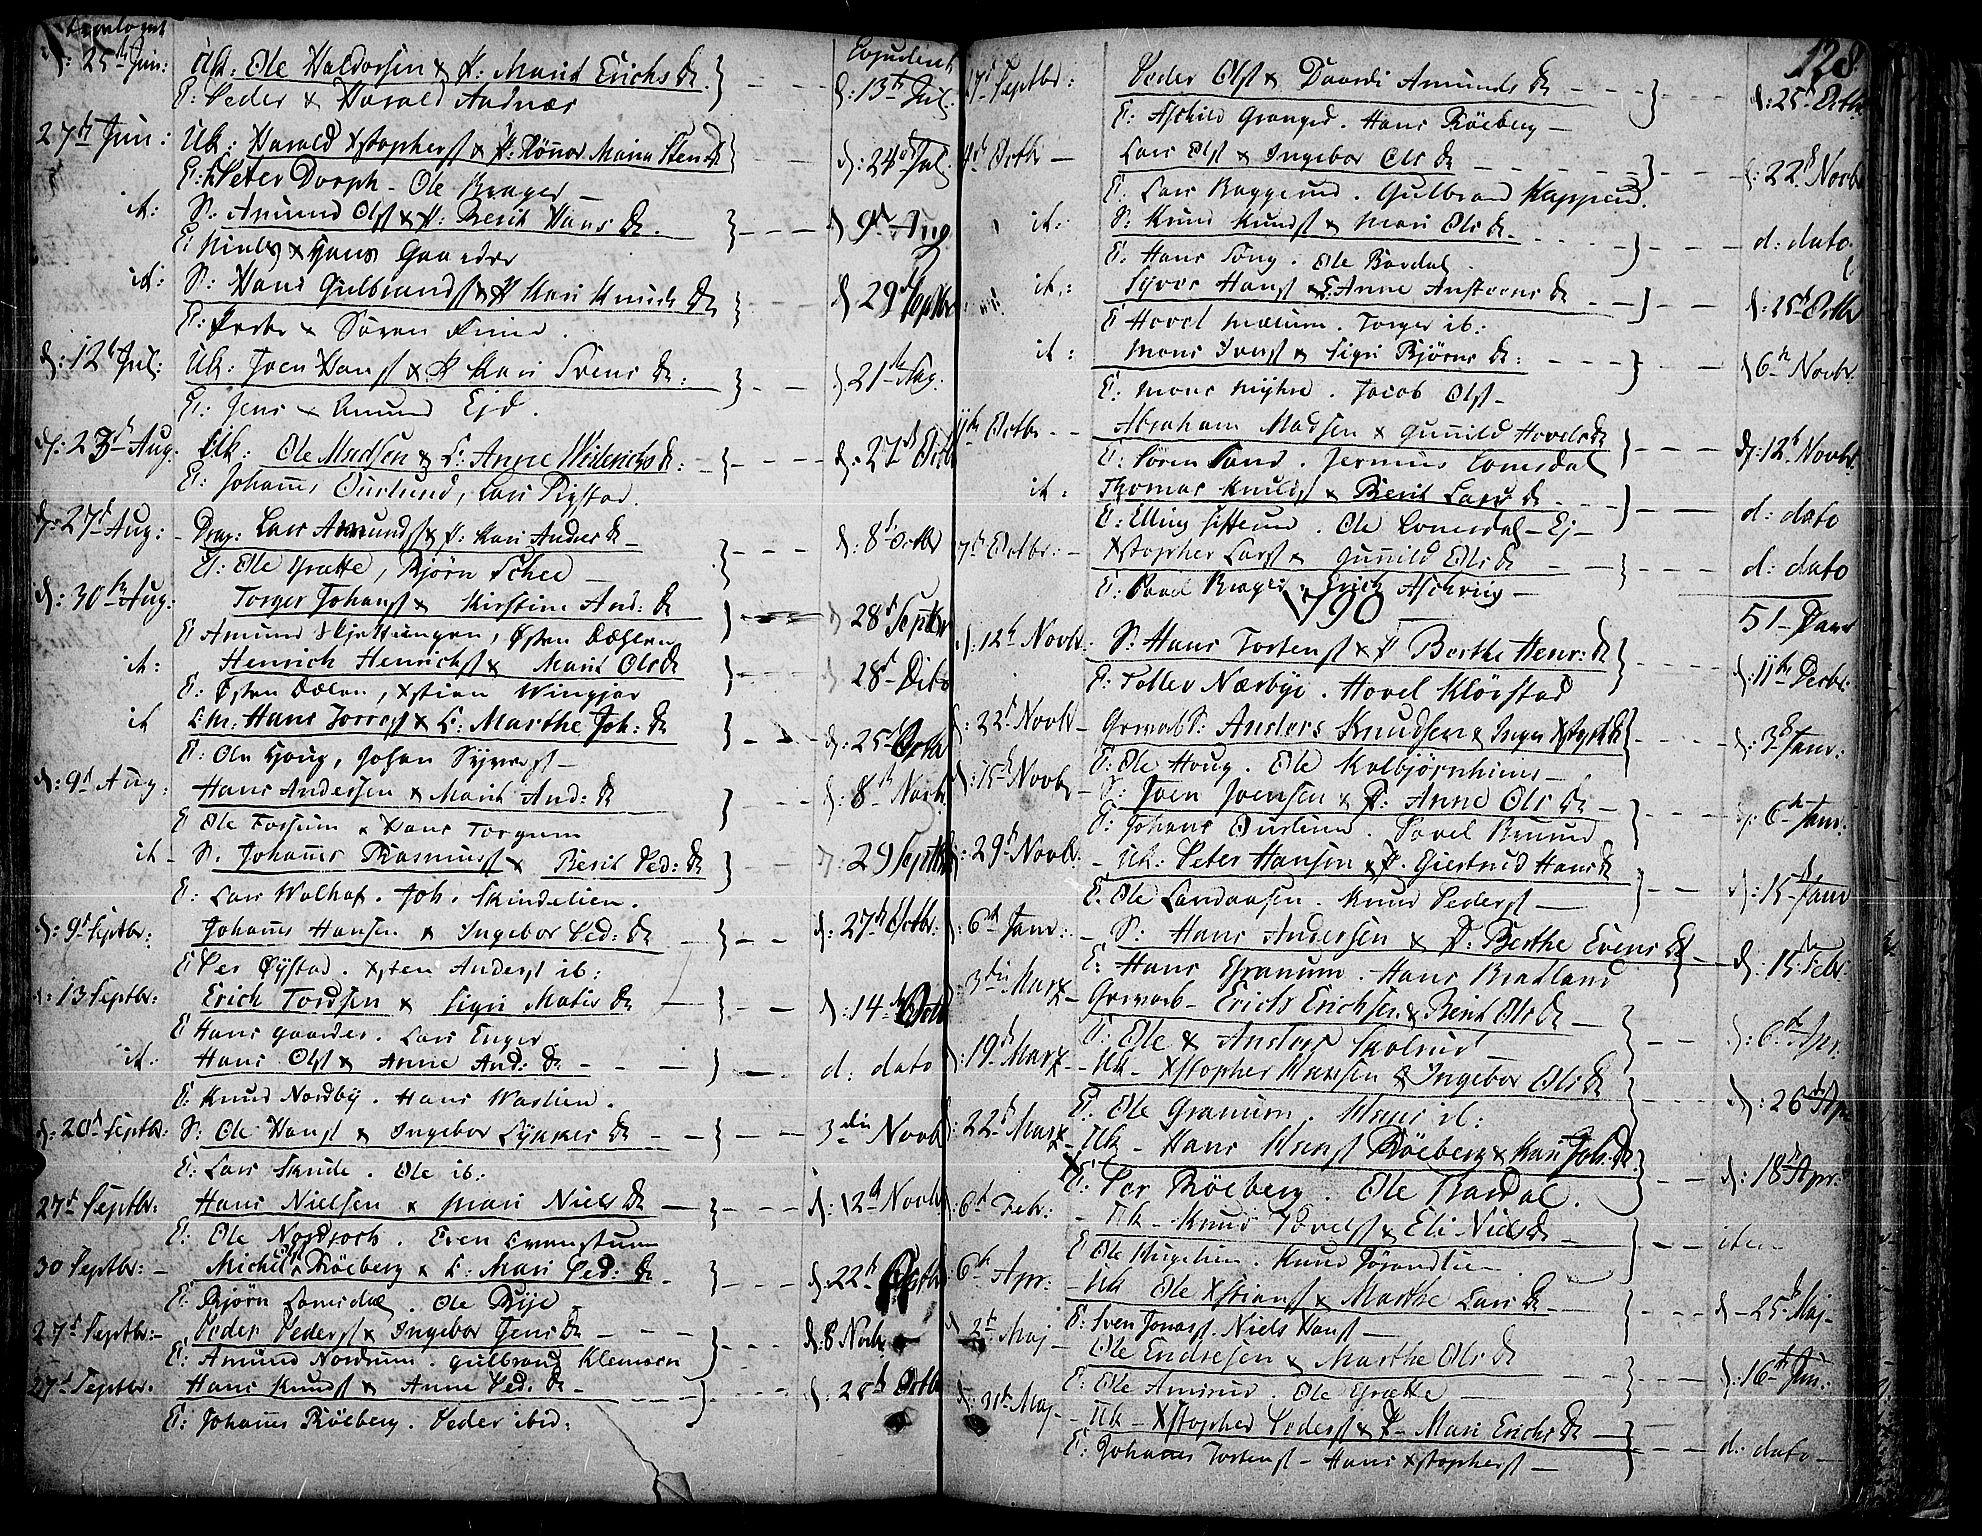 SAH, Land prestekontor, Ministerialbok nr. 6, 1784-1813, s. 128